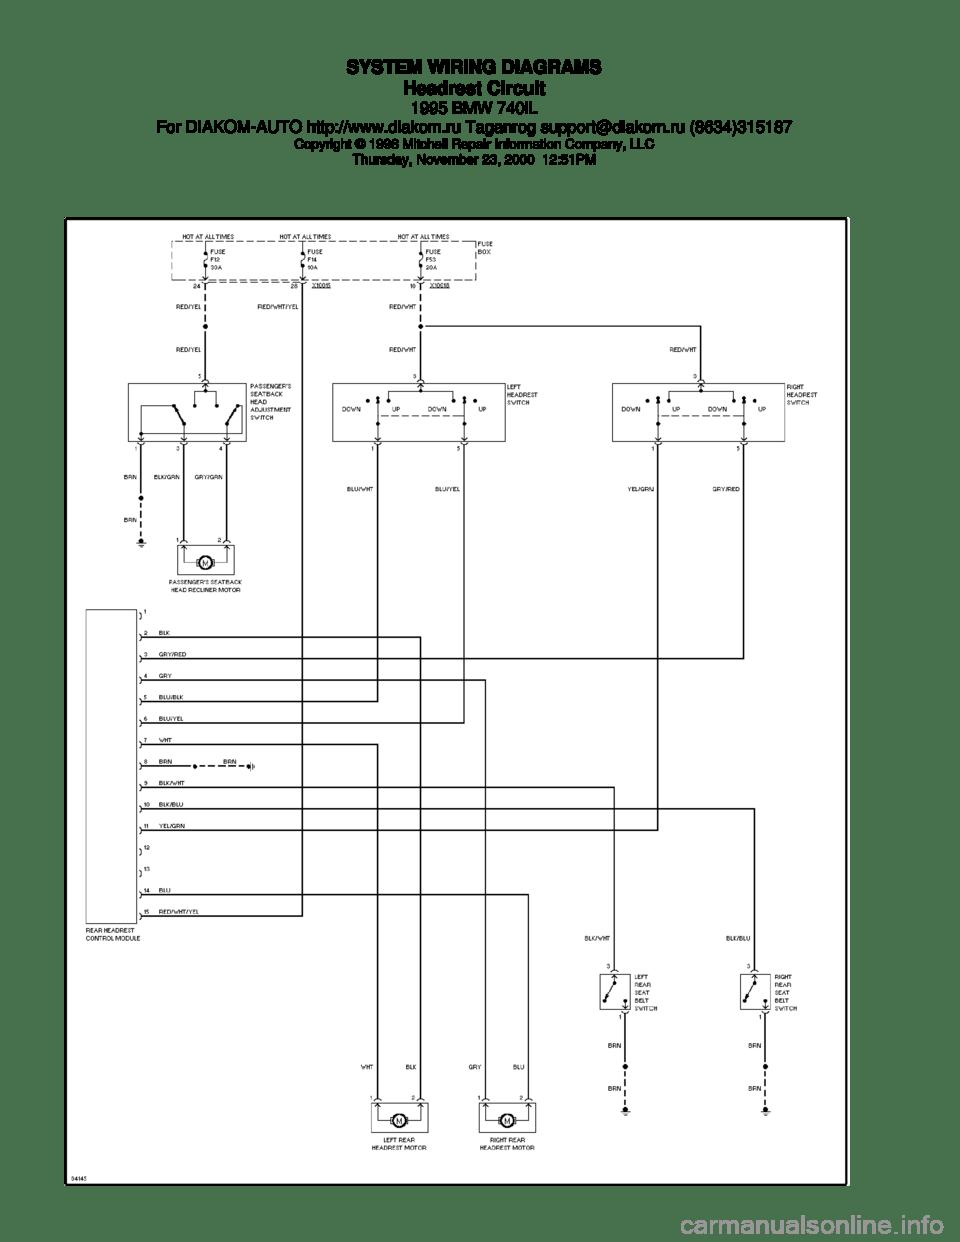 bmw 740il wiring diagram circuit diagram templatebmw 740i wiring diagram 1993 bmw 740il wiring diagram schematicbmw 740il wiring diagram wiring diagram third